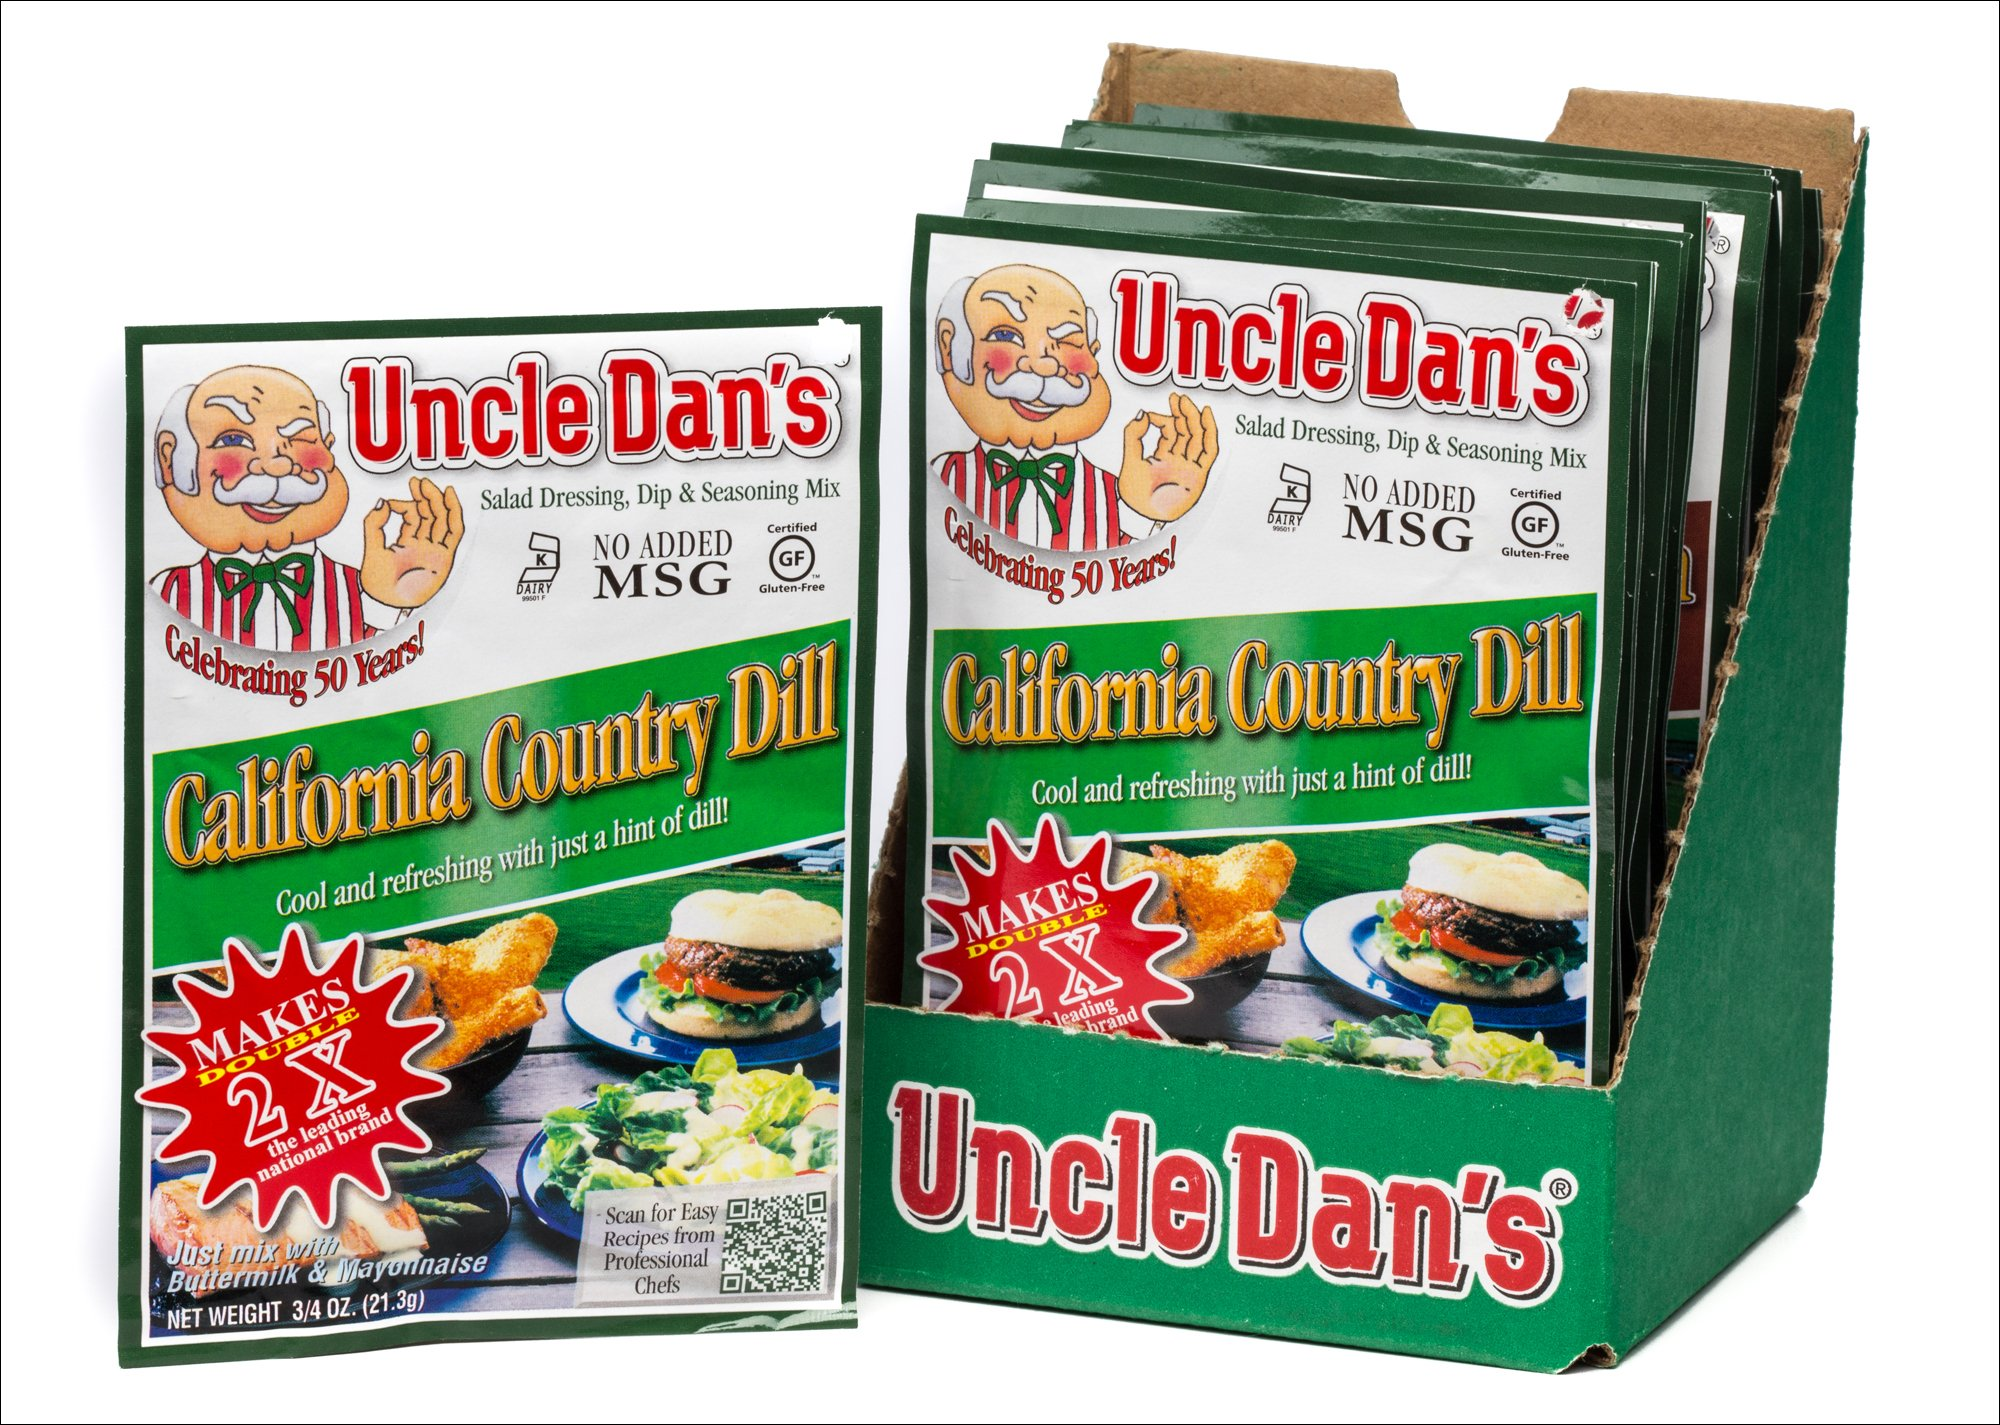 Uncle Dan's California Country Dill Dressing, Dip, & Seasoning Mix - 12 Pack Case